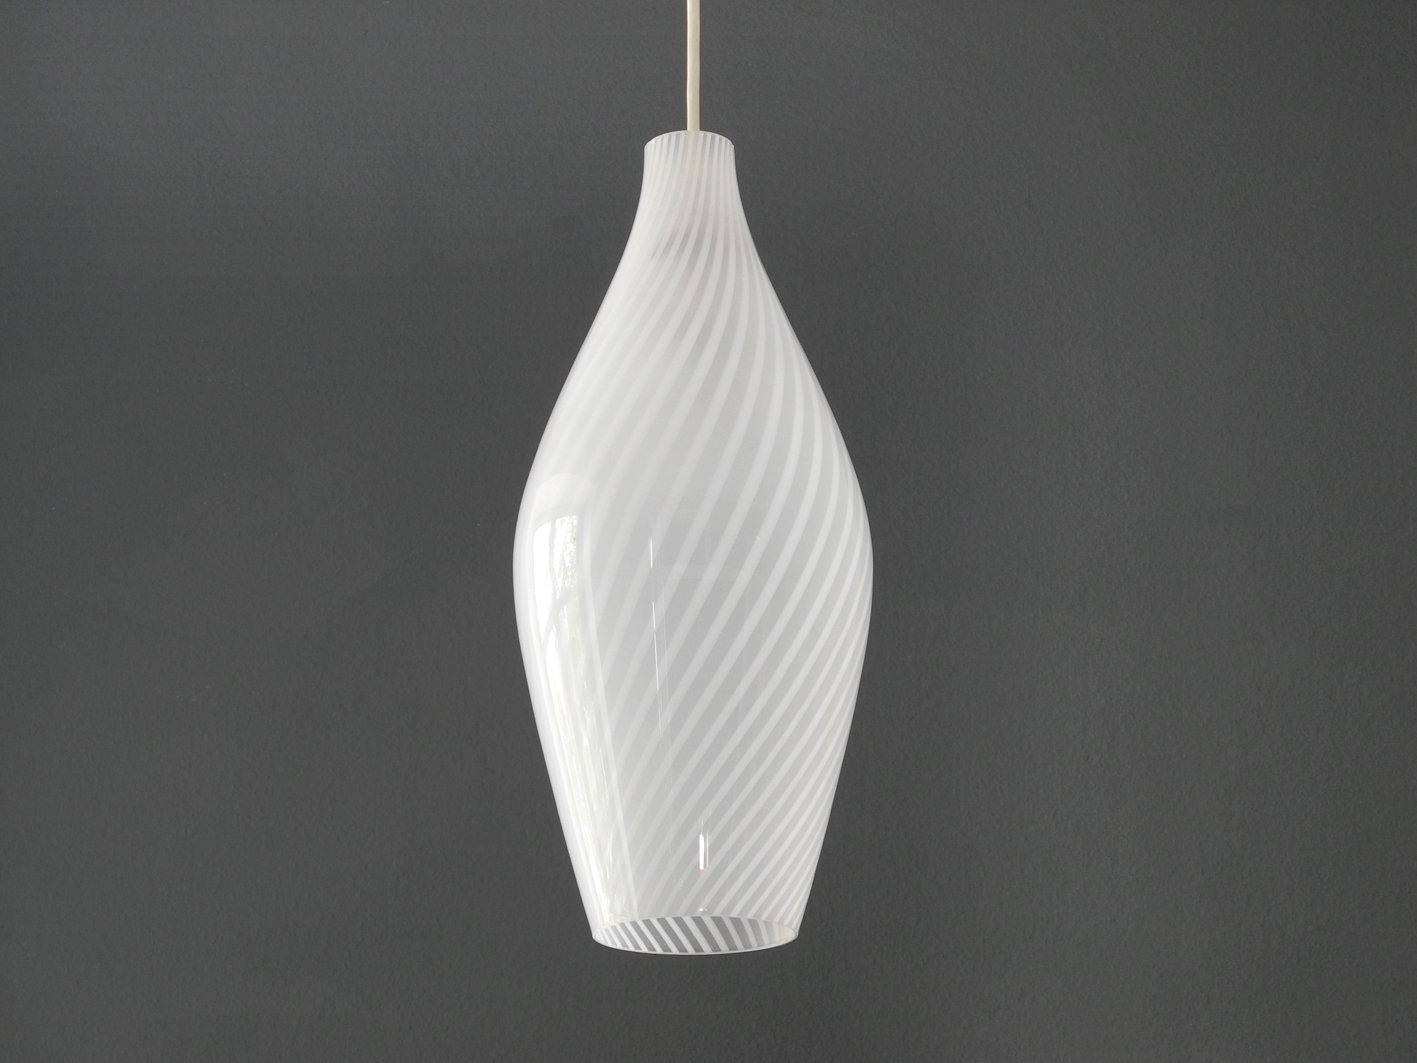 large glass pendant light. Large Mid-Century Tossa Glass Pendant Lamp By Aloys Gangkofner For Peill \u0026 Putzler Light